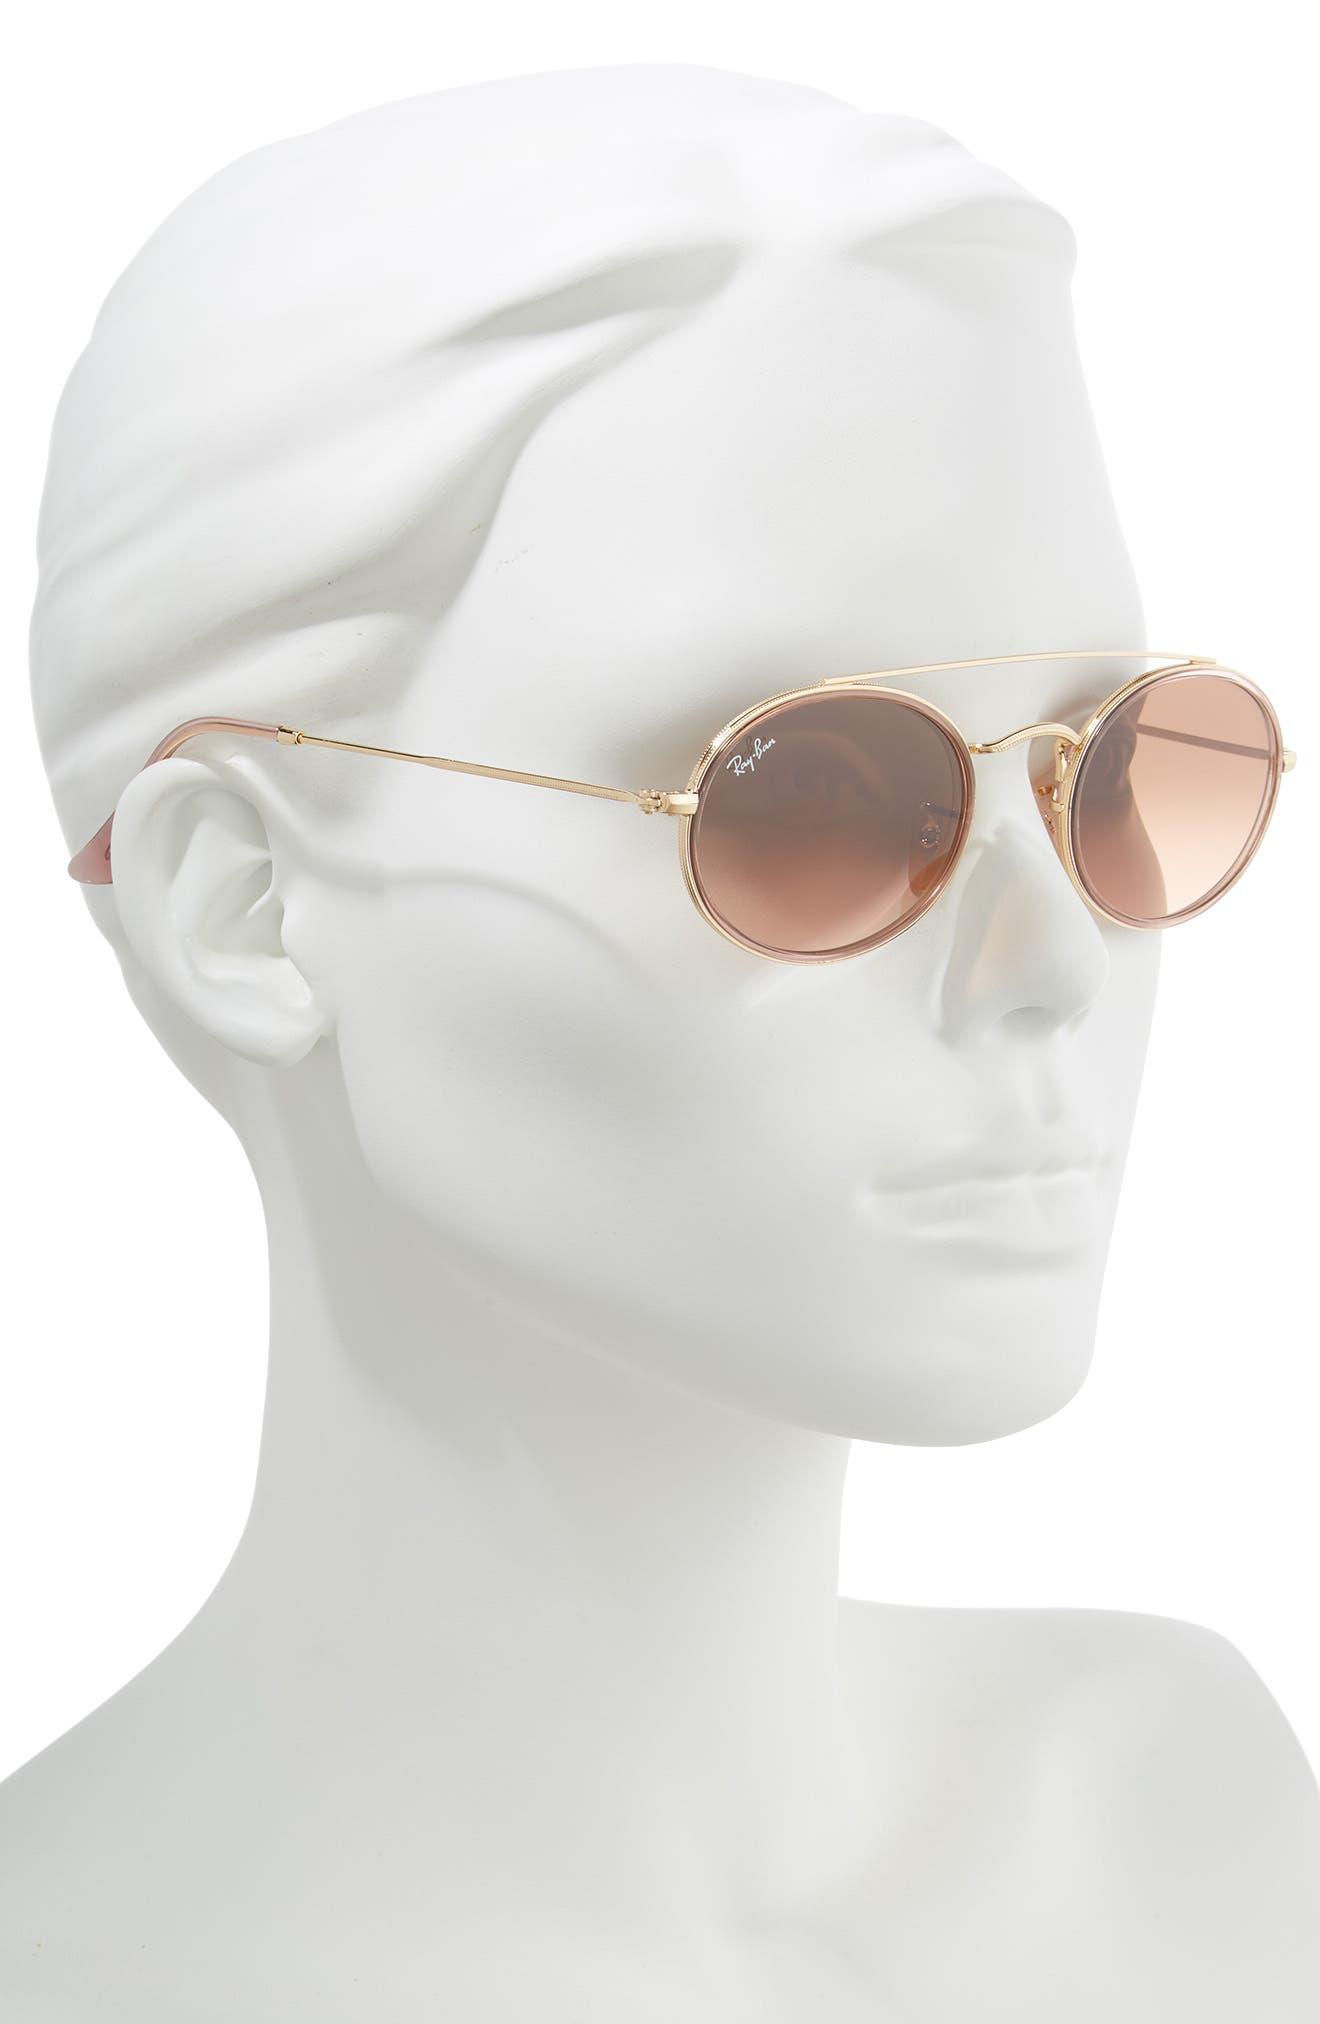 Elite 52mm Gradient Oval Sunglasses,                             Alternate thumbnail 2, color,                             712